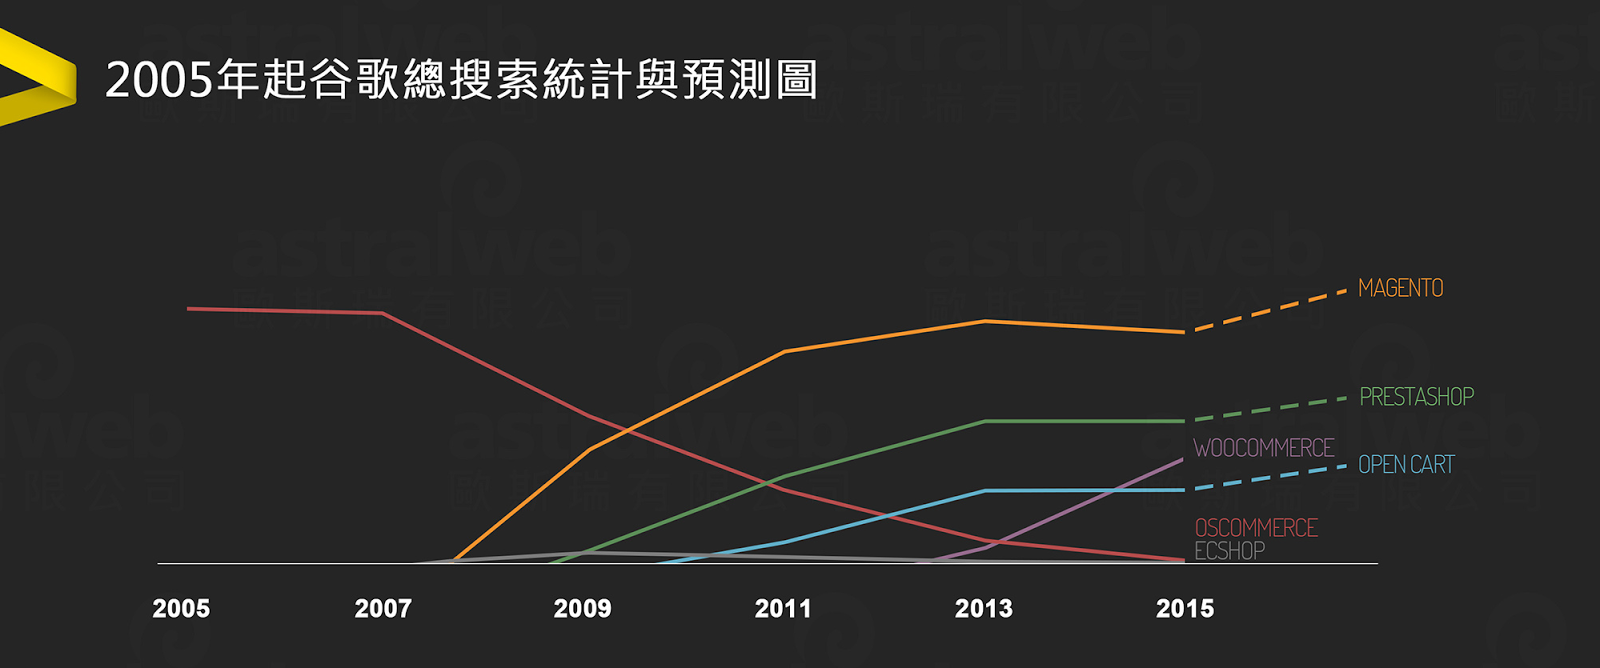 2015 Google電商系統搜尋預測